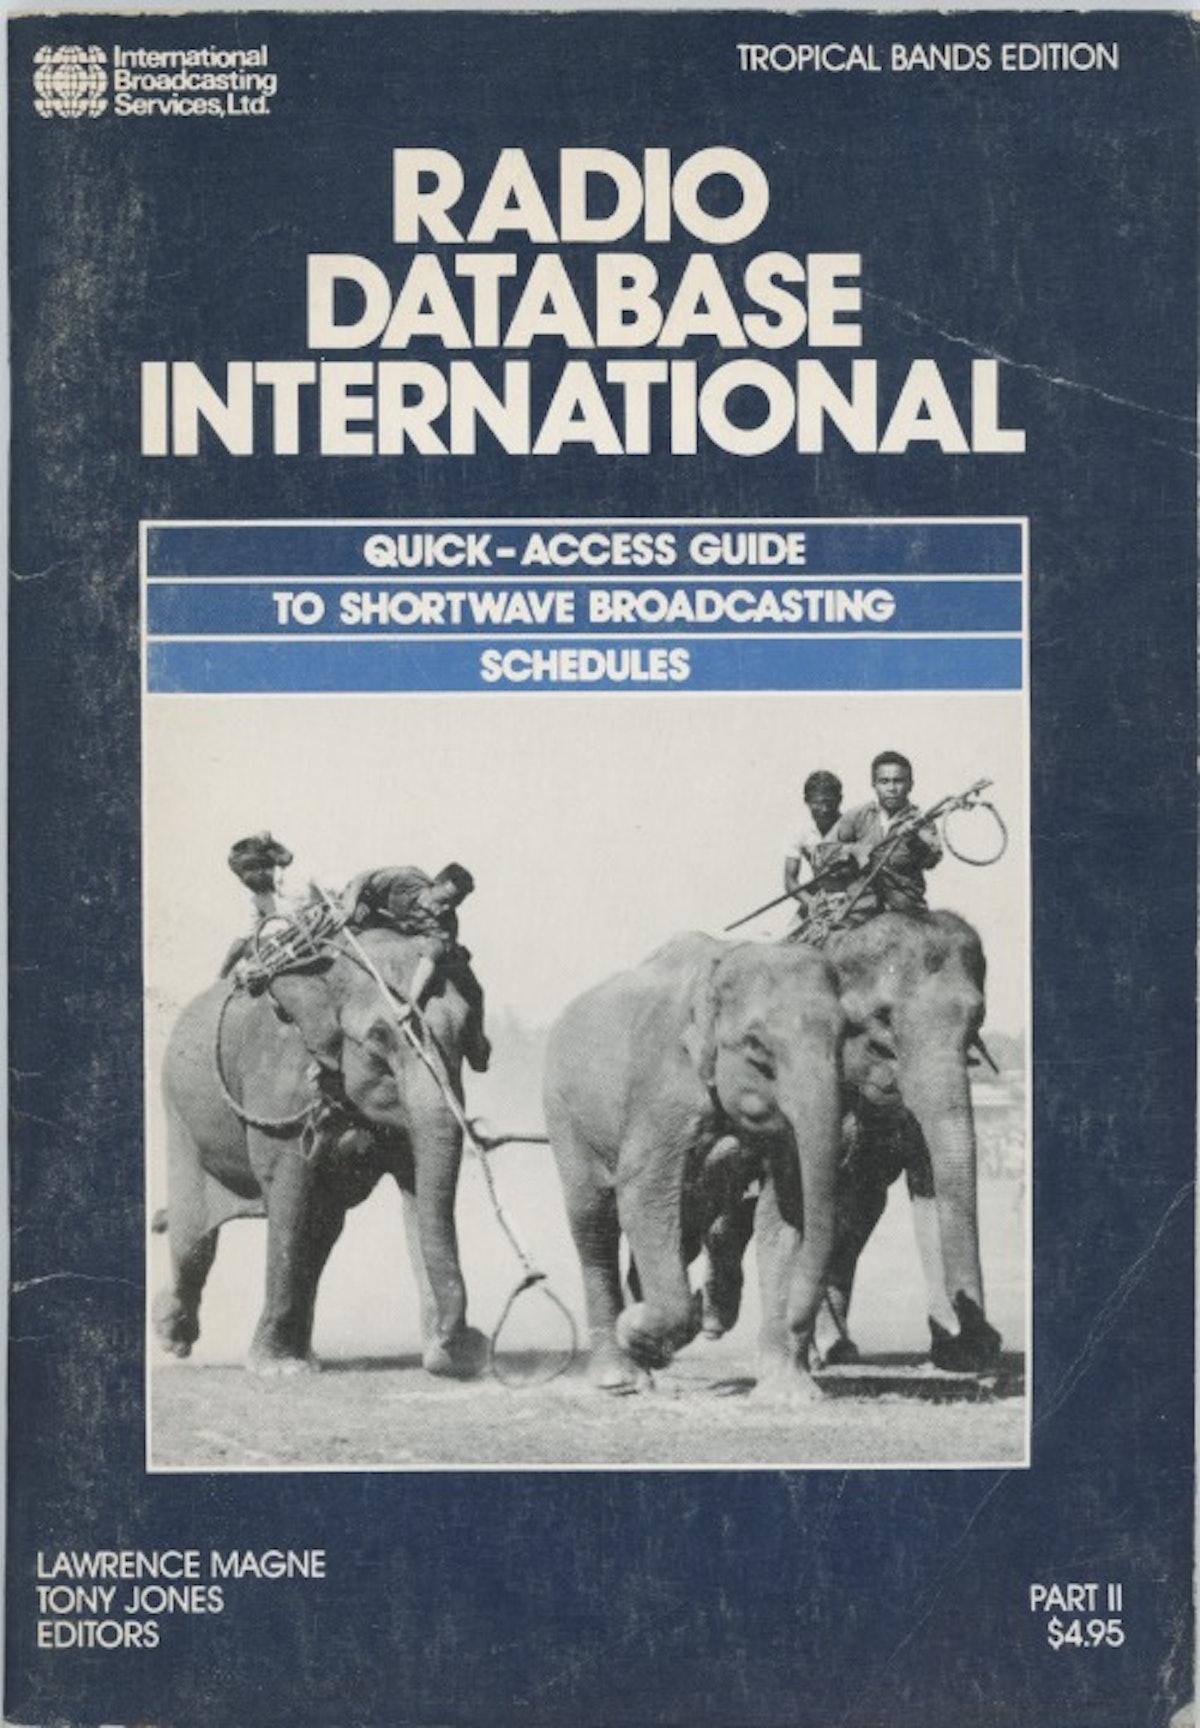 Radio Database International: Part II Tropical Bands Edition